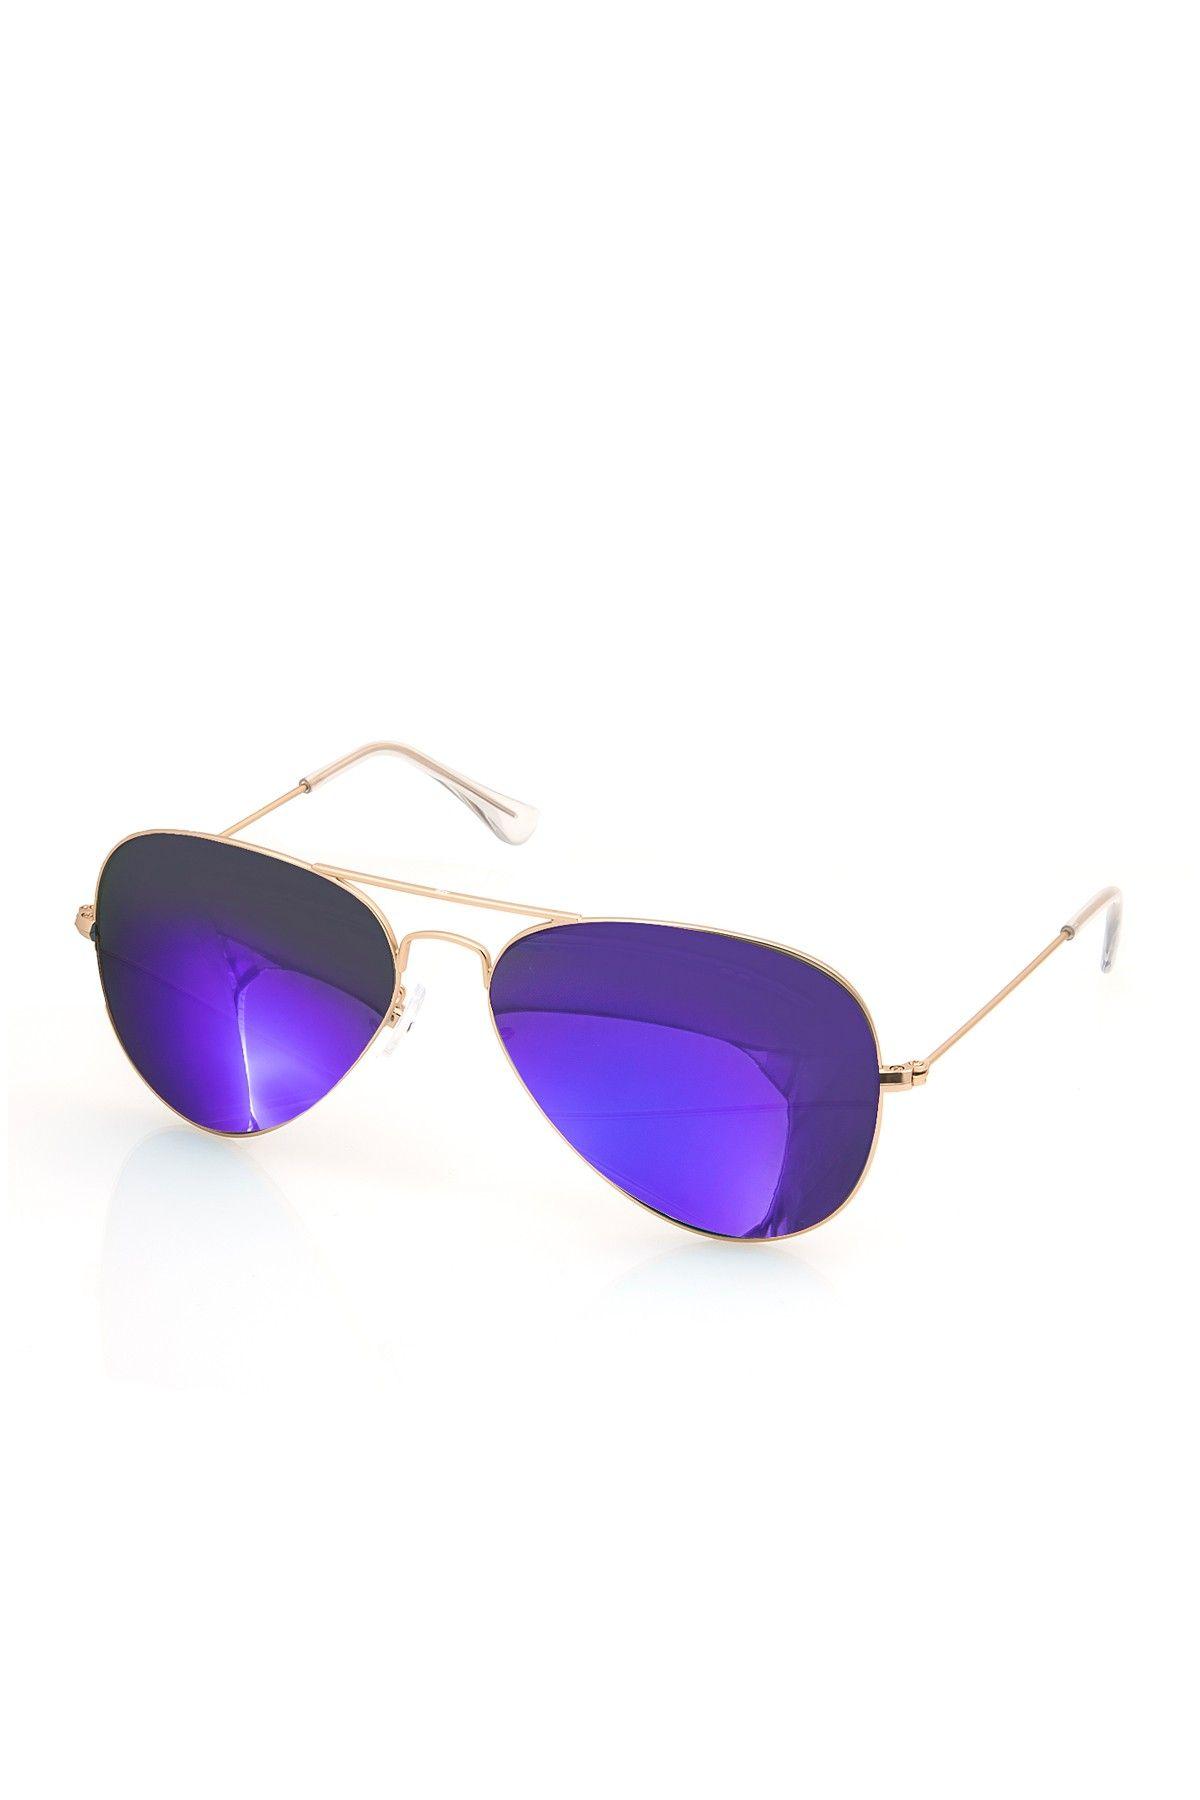 b70da1f636d0 AQS Sunglasses